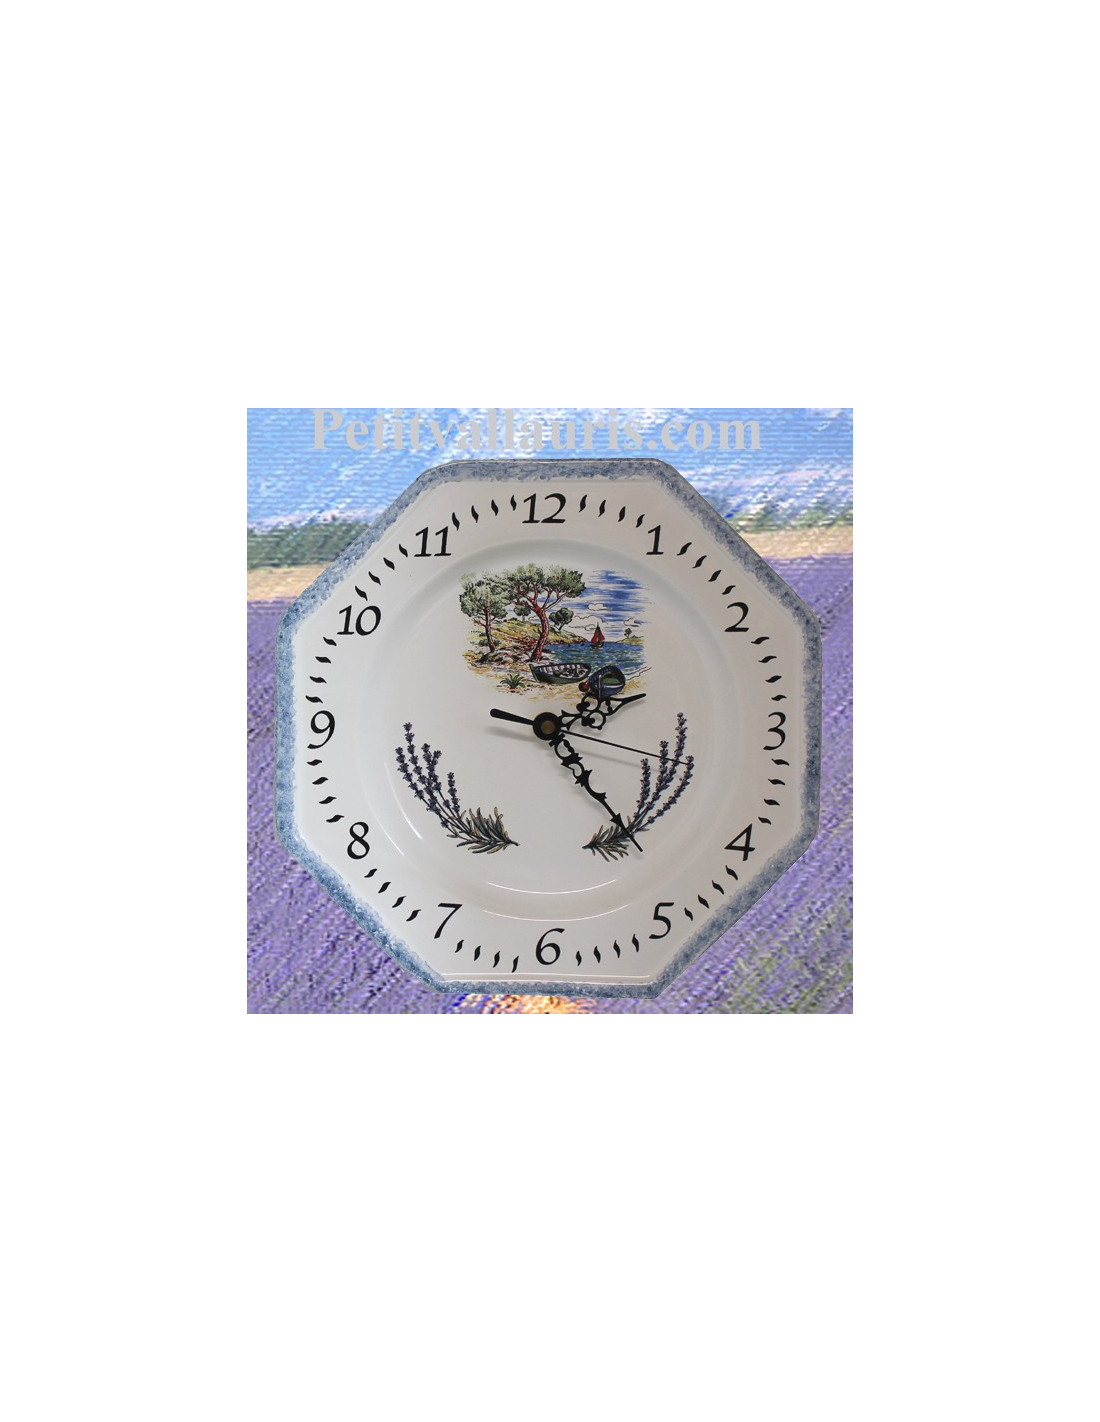 Horloge murale octogonale en fa ence d cor motif for Faience decorative murale